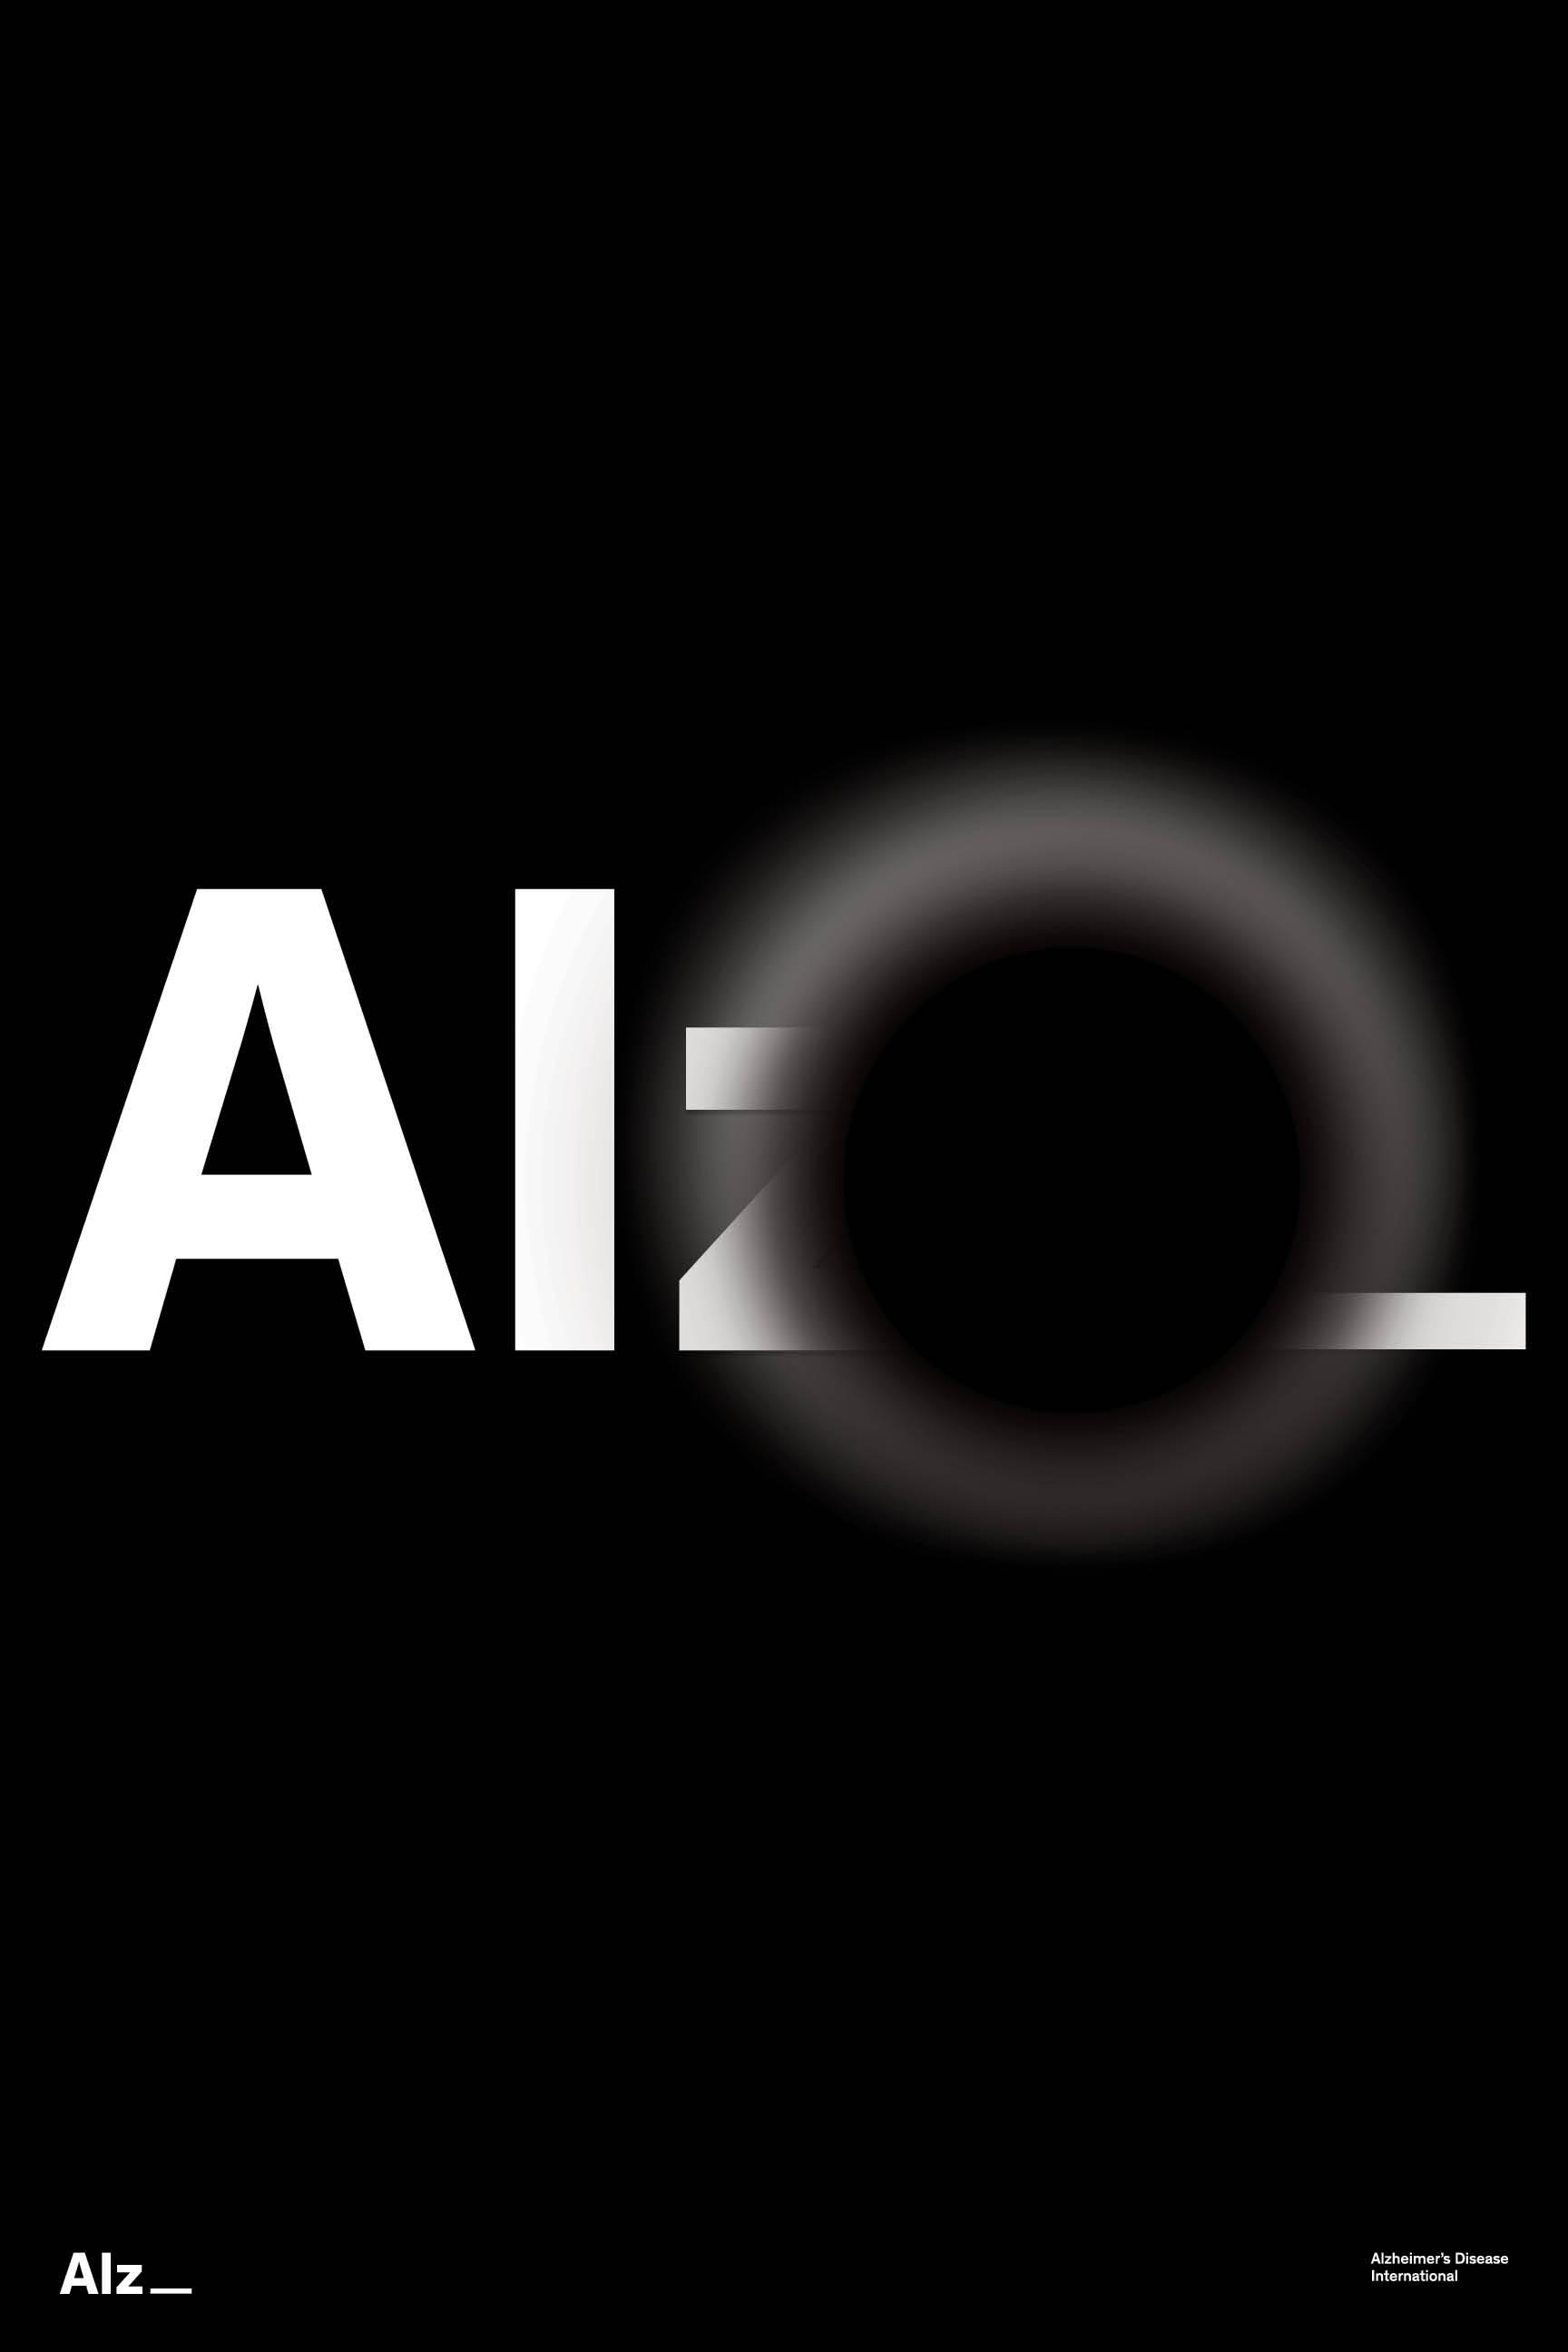 Alz_poster_2.jpg